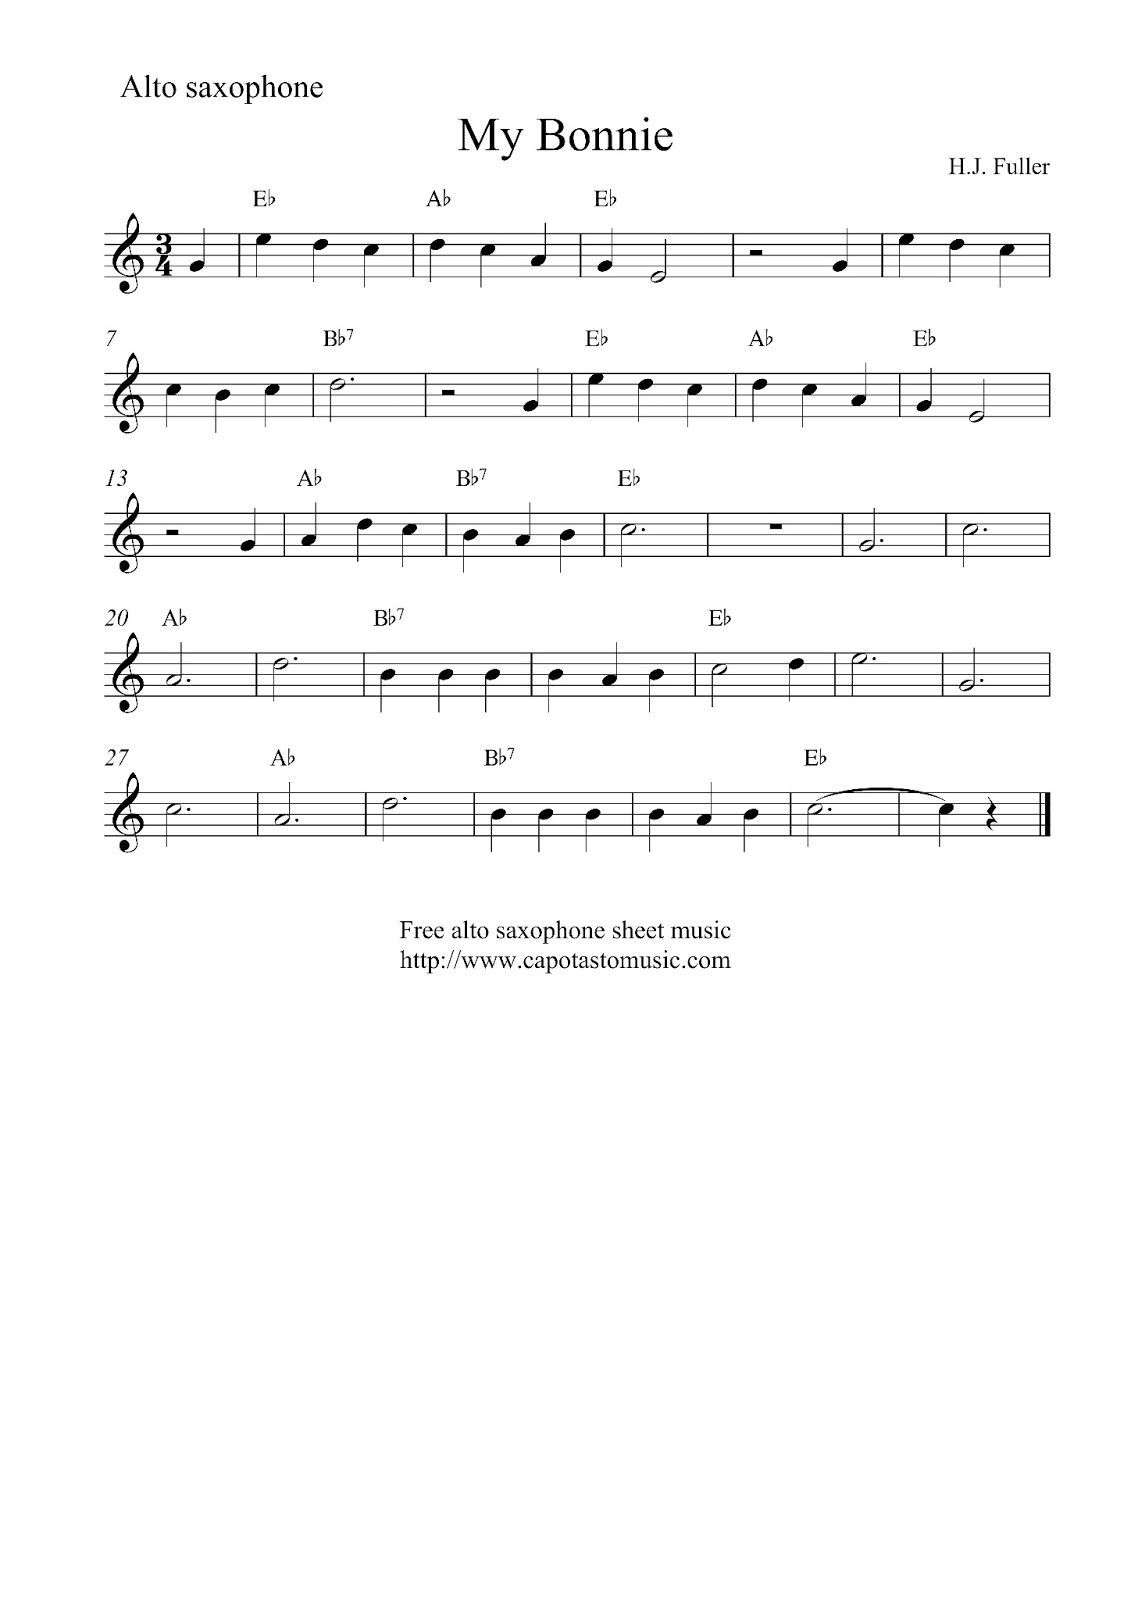 Alto Sax Easy Songs |  Sheet Music Scores: Free Easy Alto - Free Printable Alto Saxophone Sheet Music